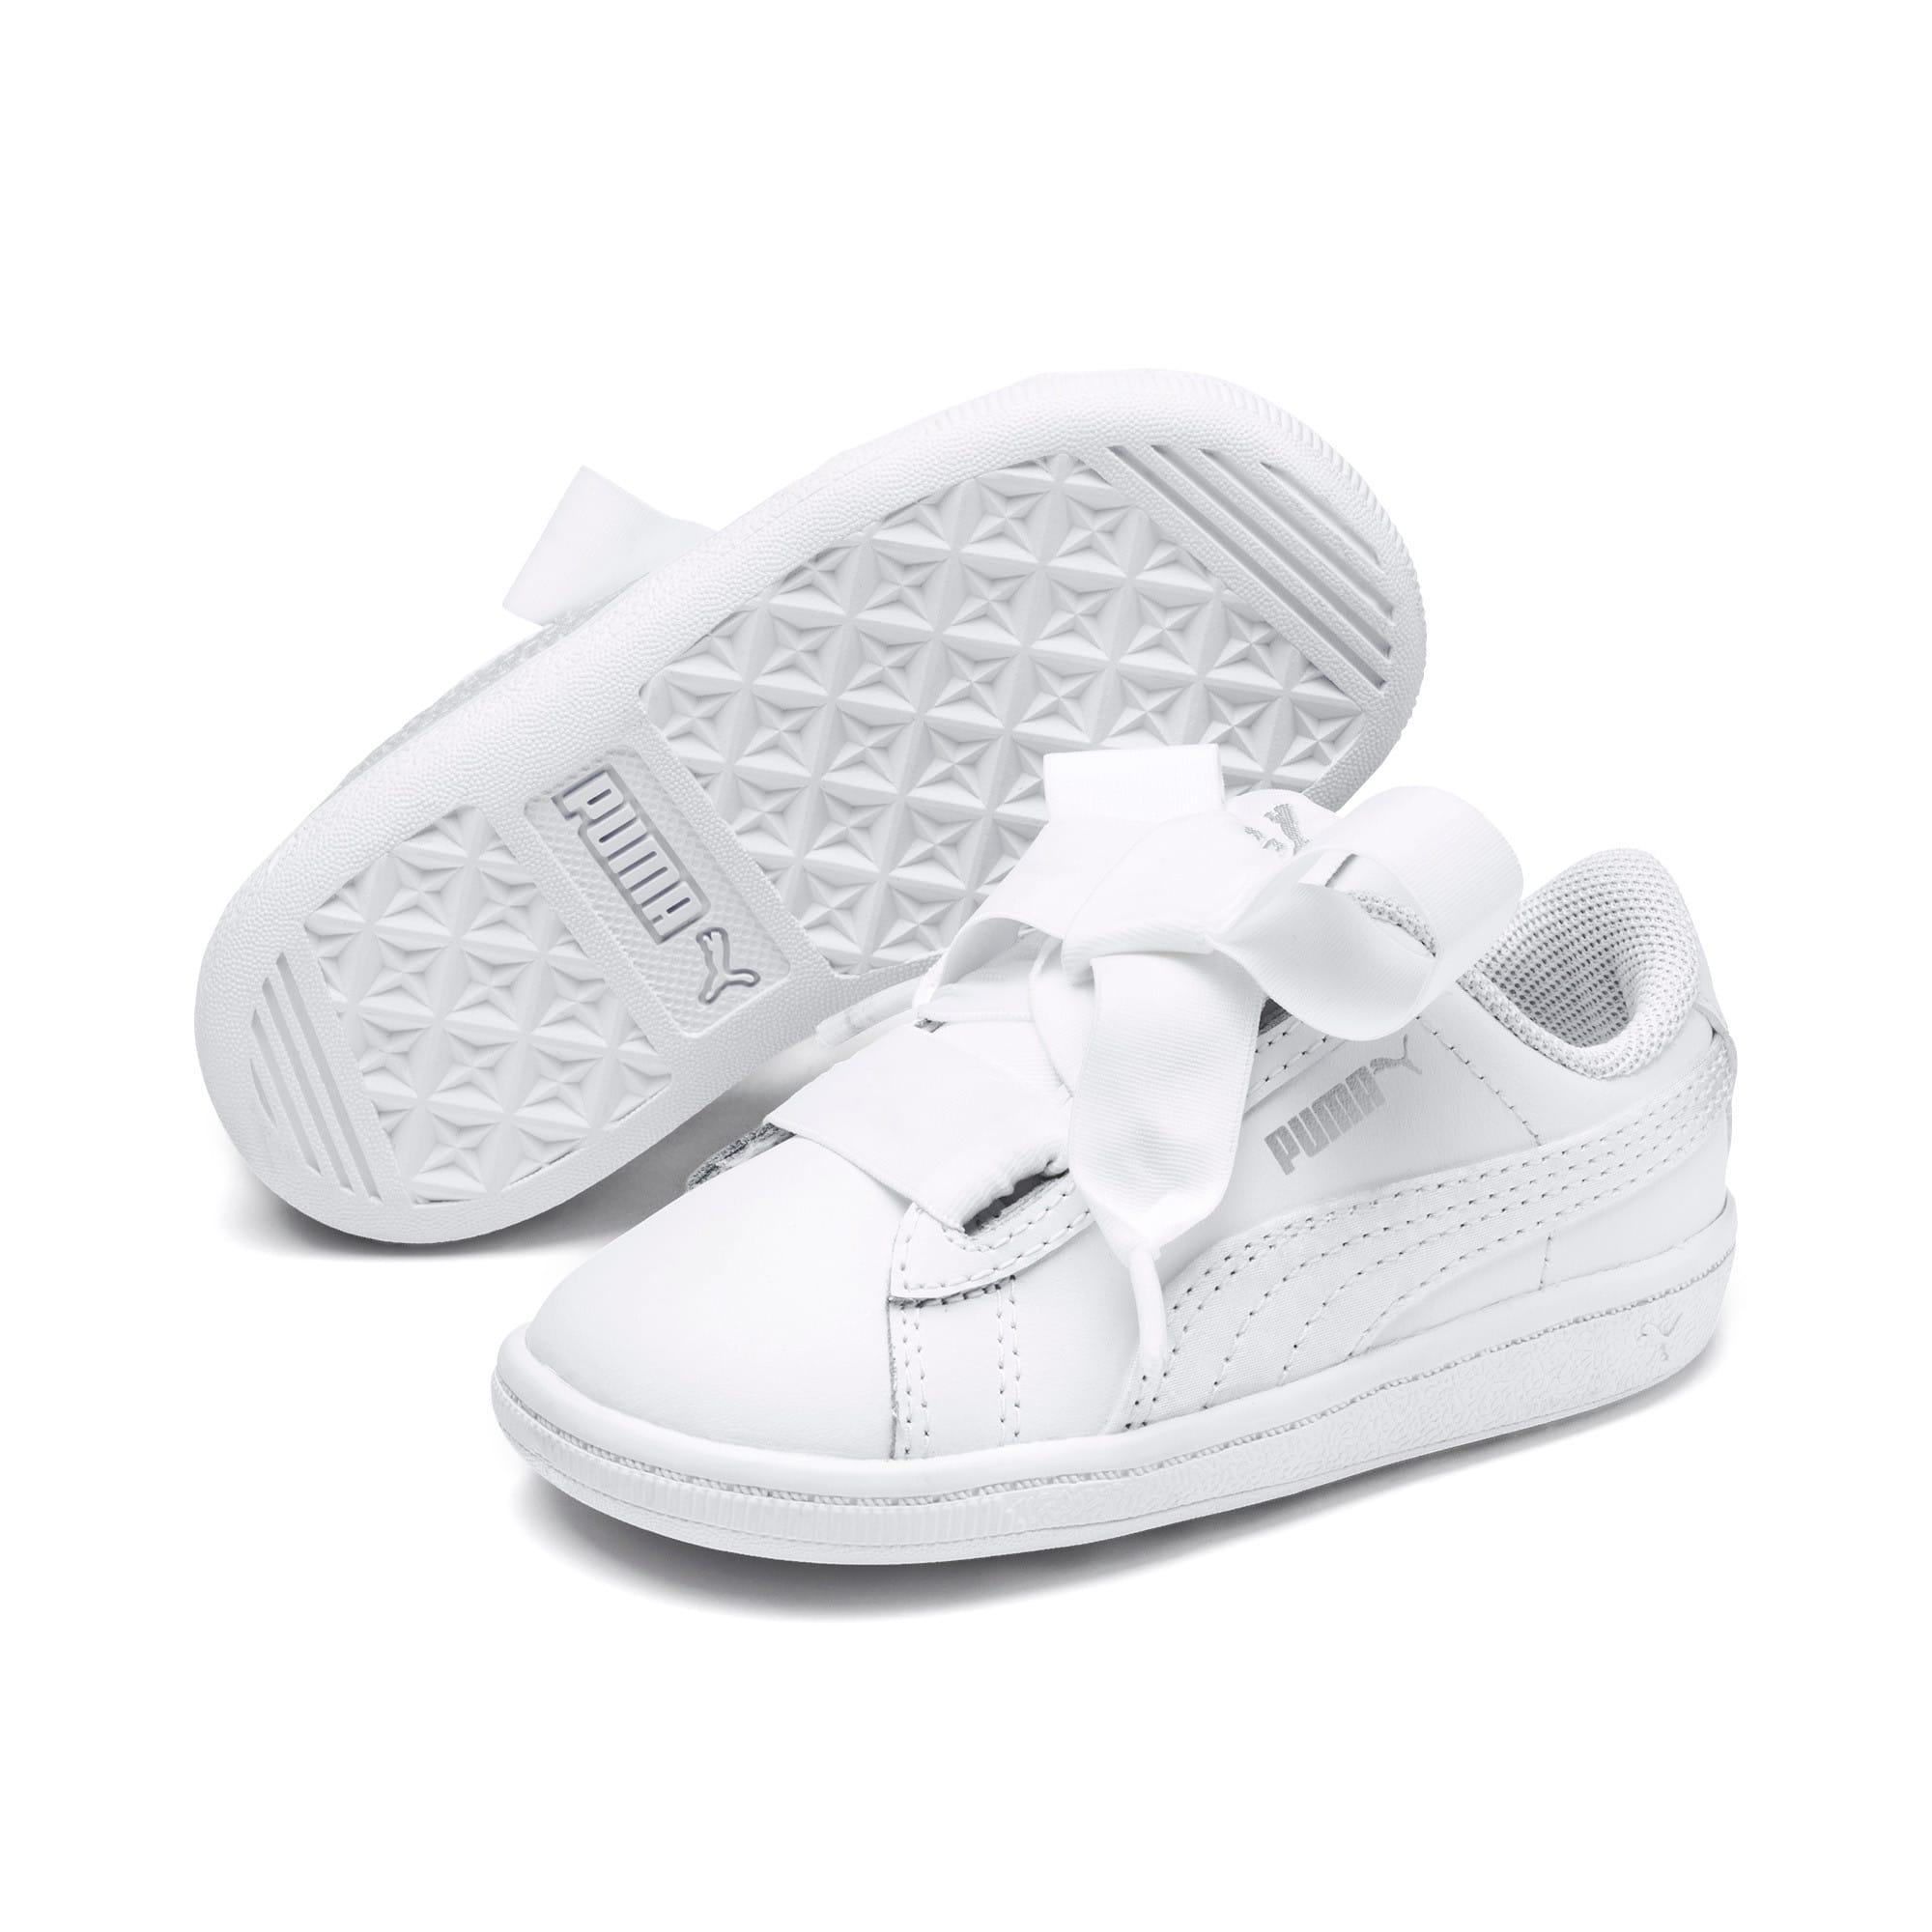 Miniatura 2 de ZapatosPUMA Vikky Ribbon Satin AC para bebés, Puma White-Puma White, mediano